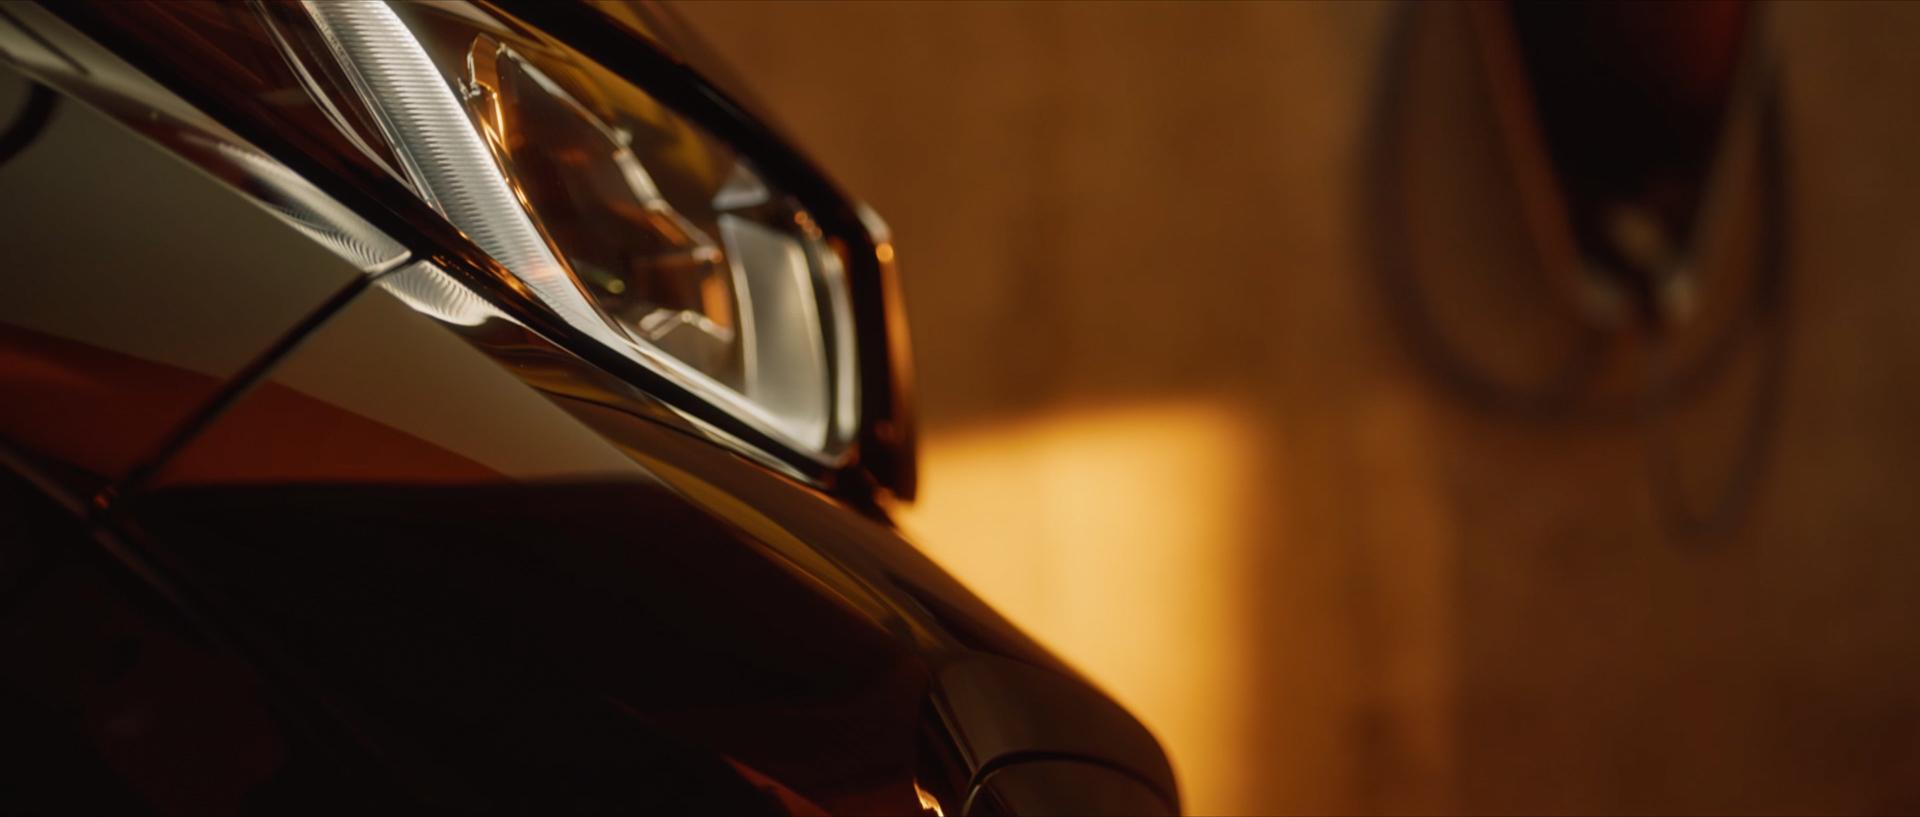 BMW-ForSite-Temp-2.jpg